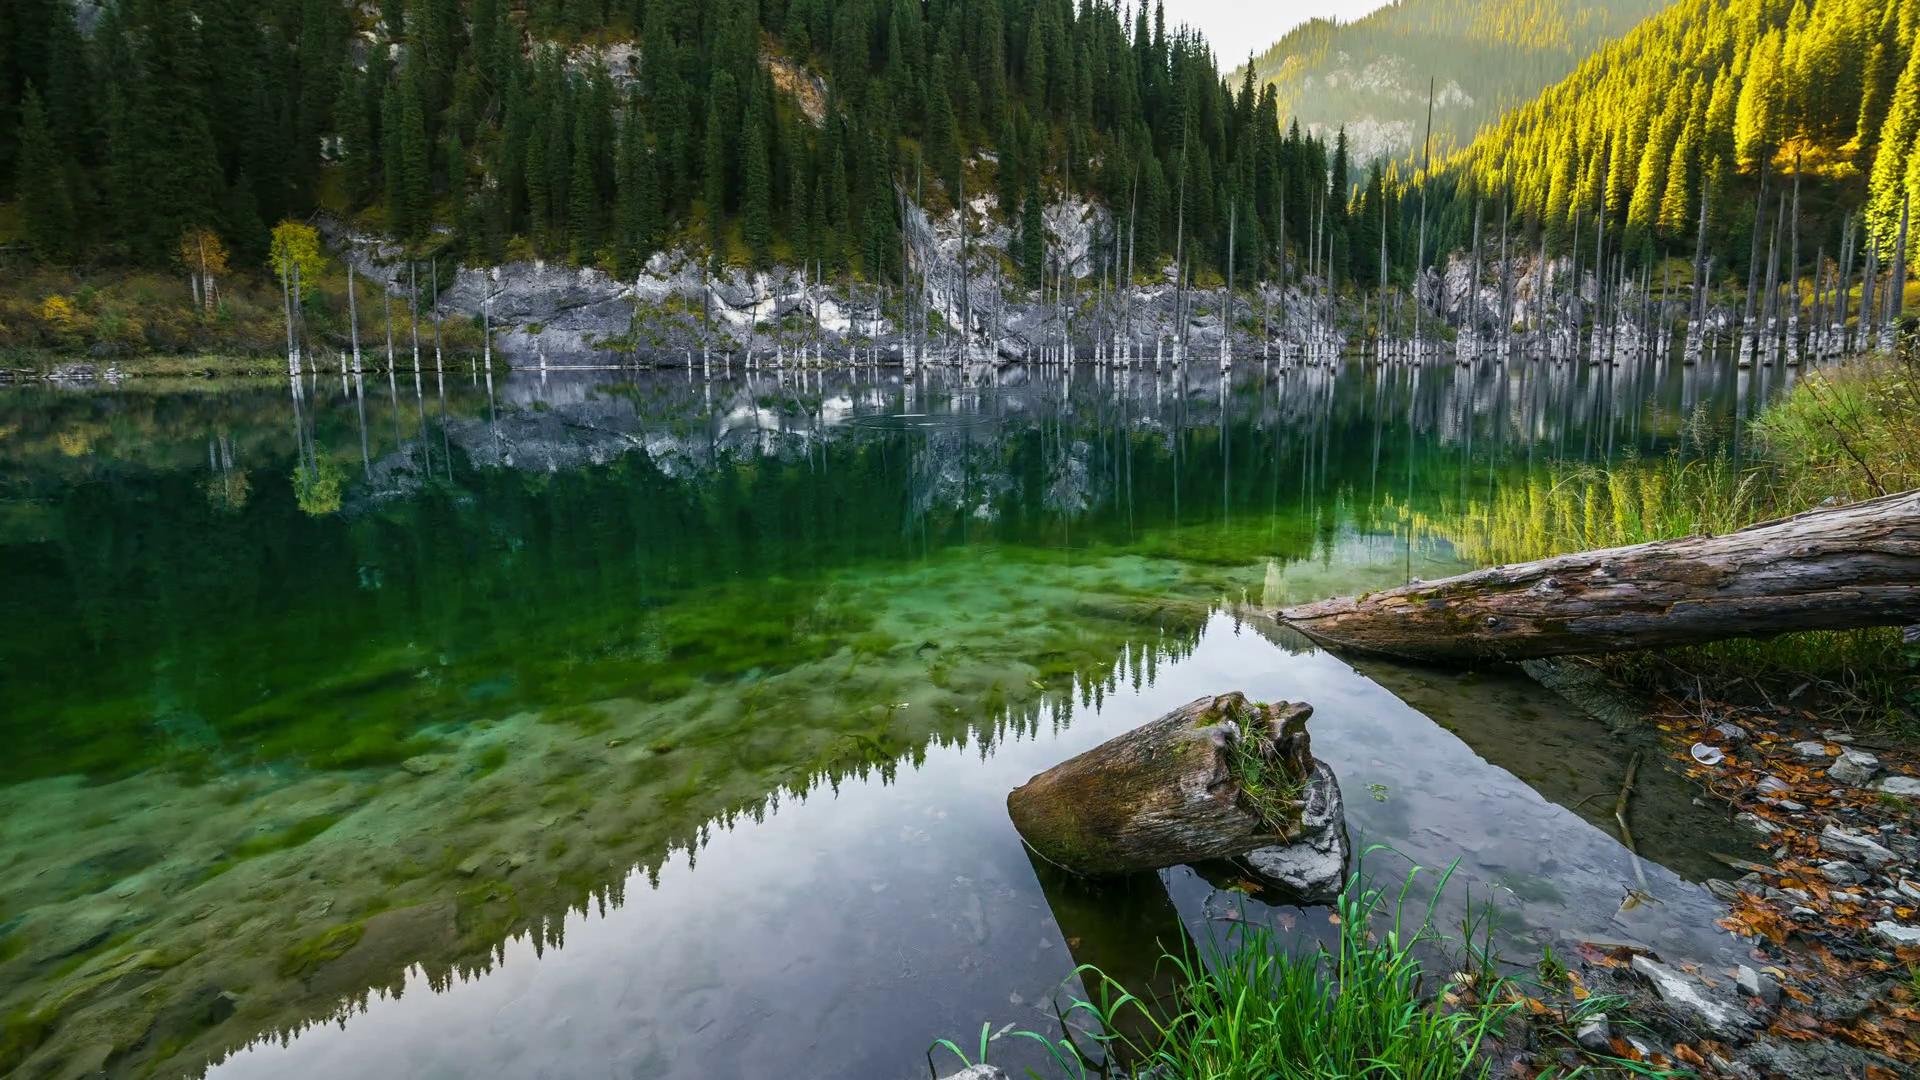 majestic-mountain-lake-kaindy-in-mountains-kazakhstan-4k-timelapse-september-2016-almaty-and-astana-kazakhstan_r0jdgdtjg